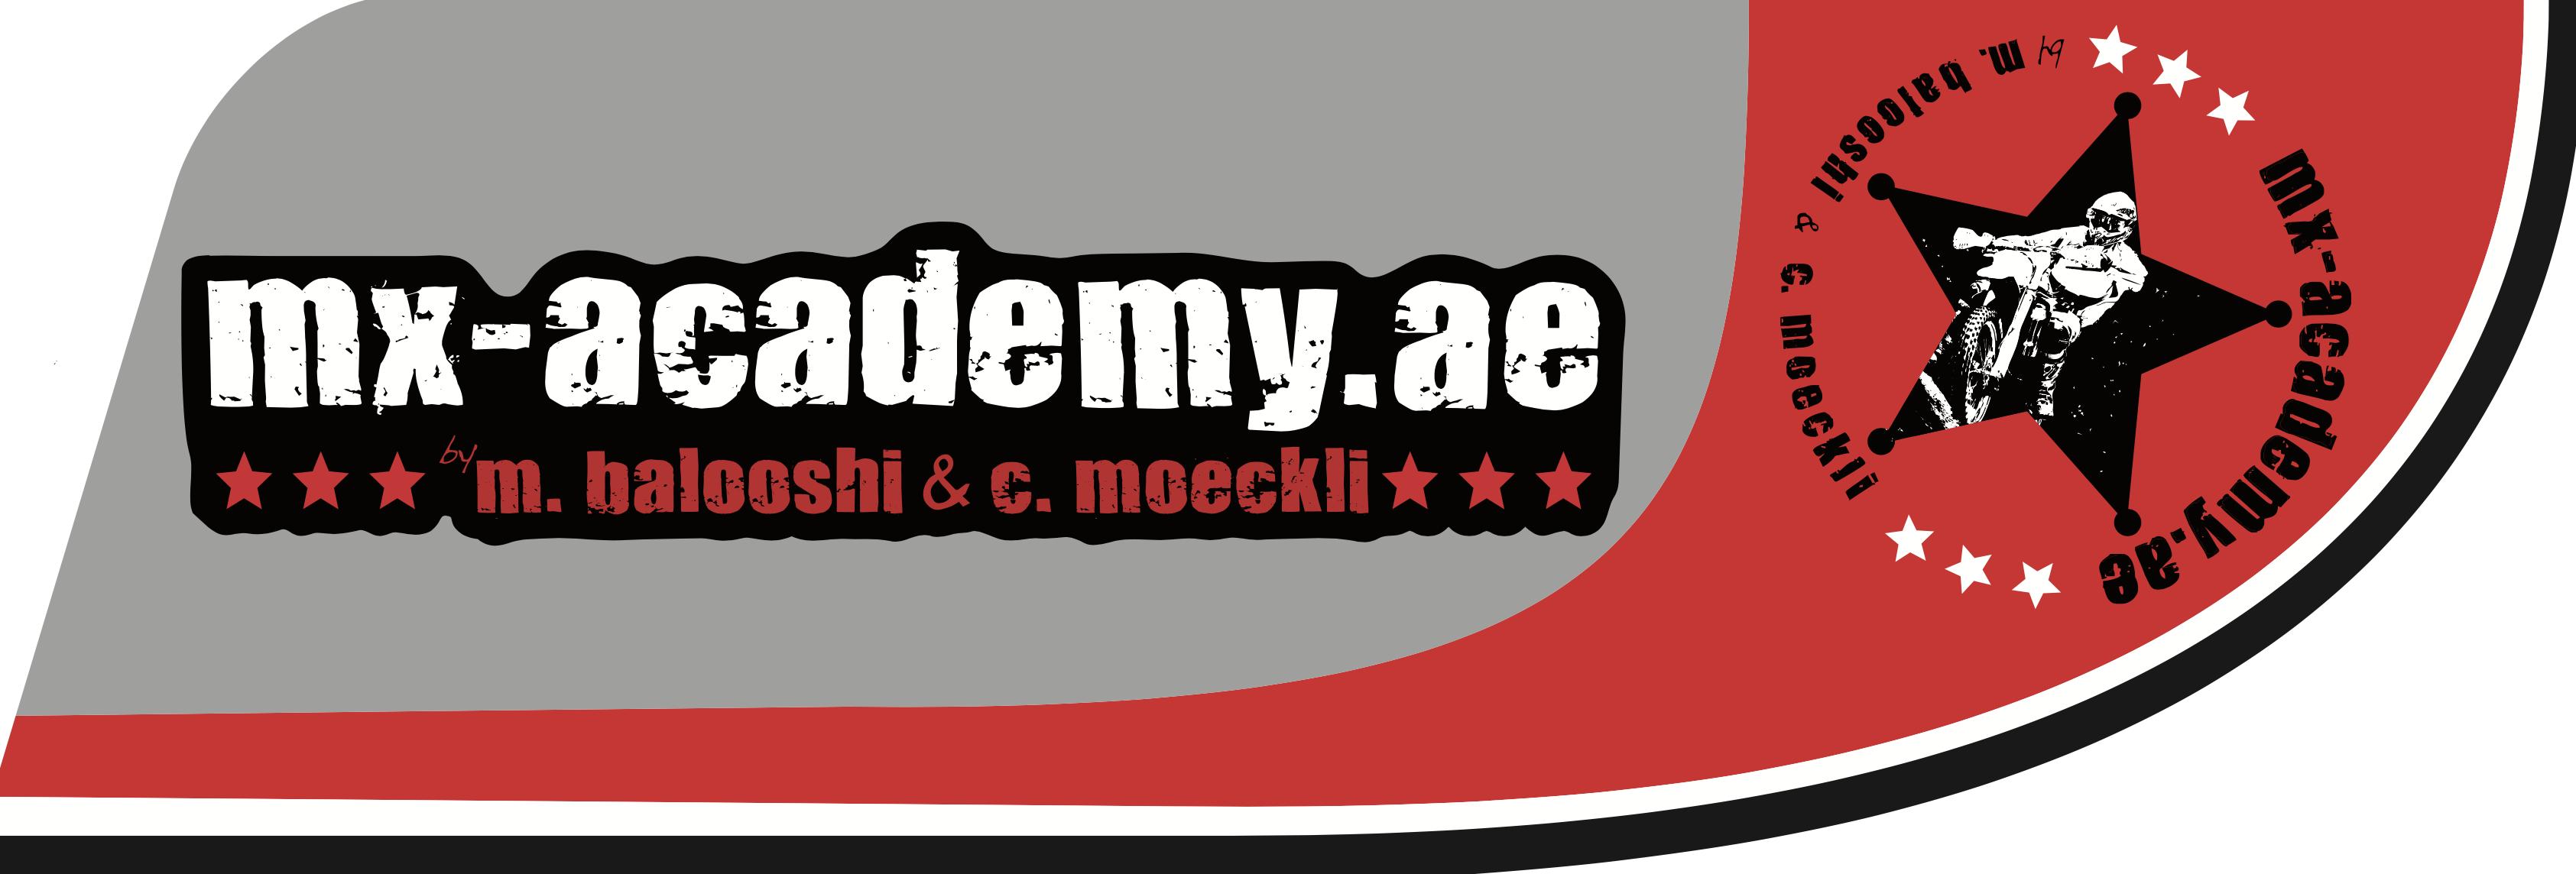 mx-academy-dubai-logo-e1620881892971